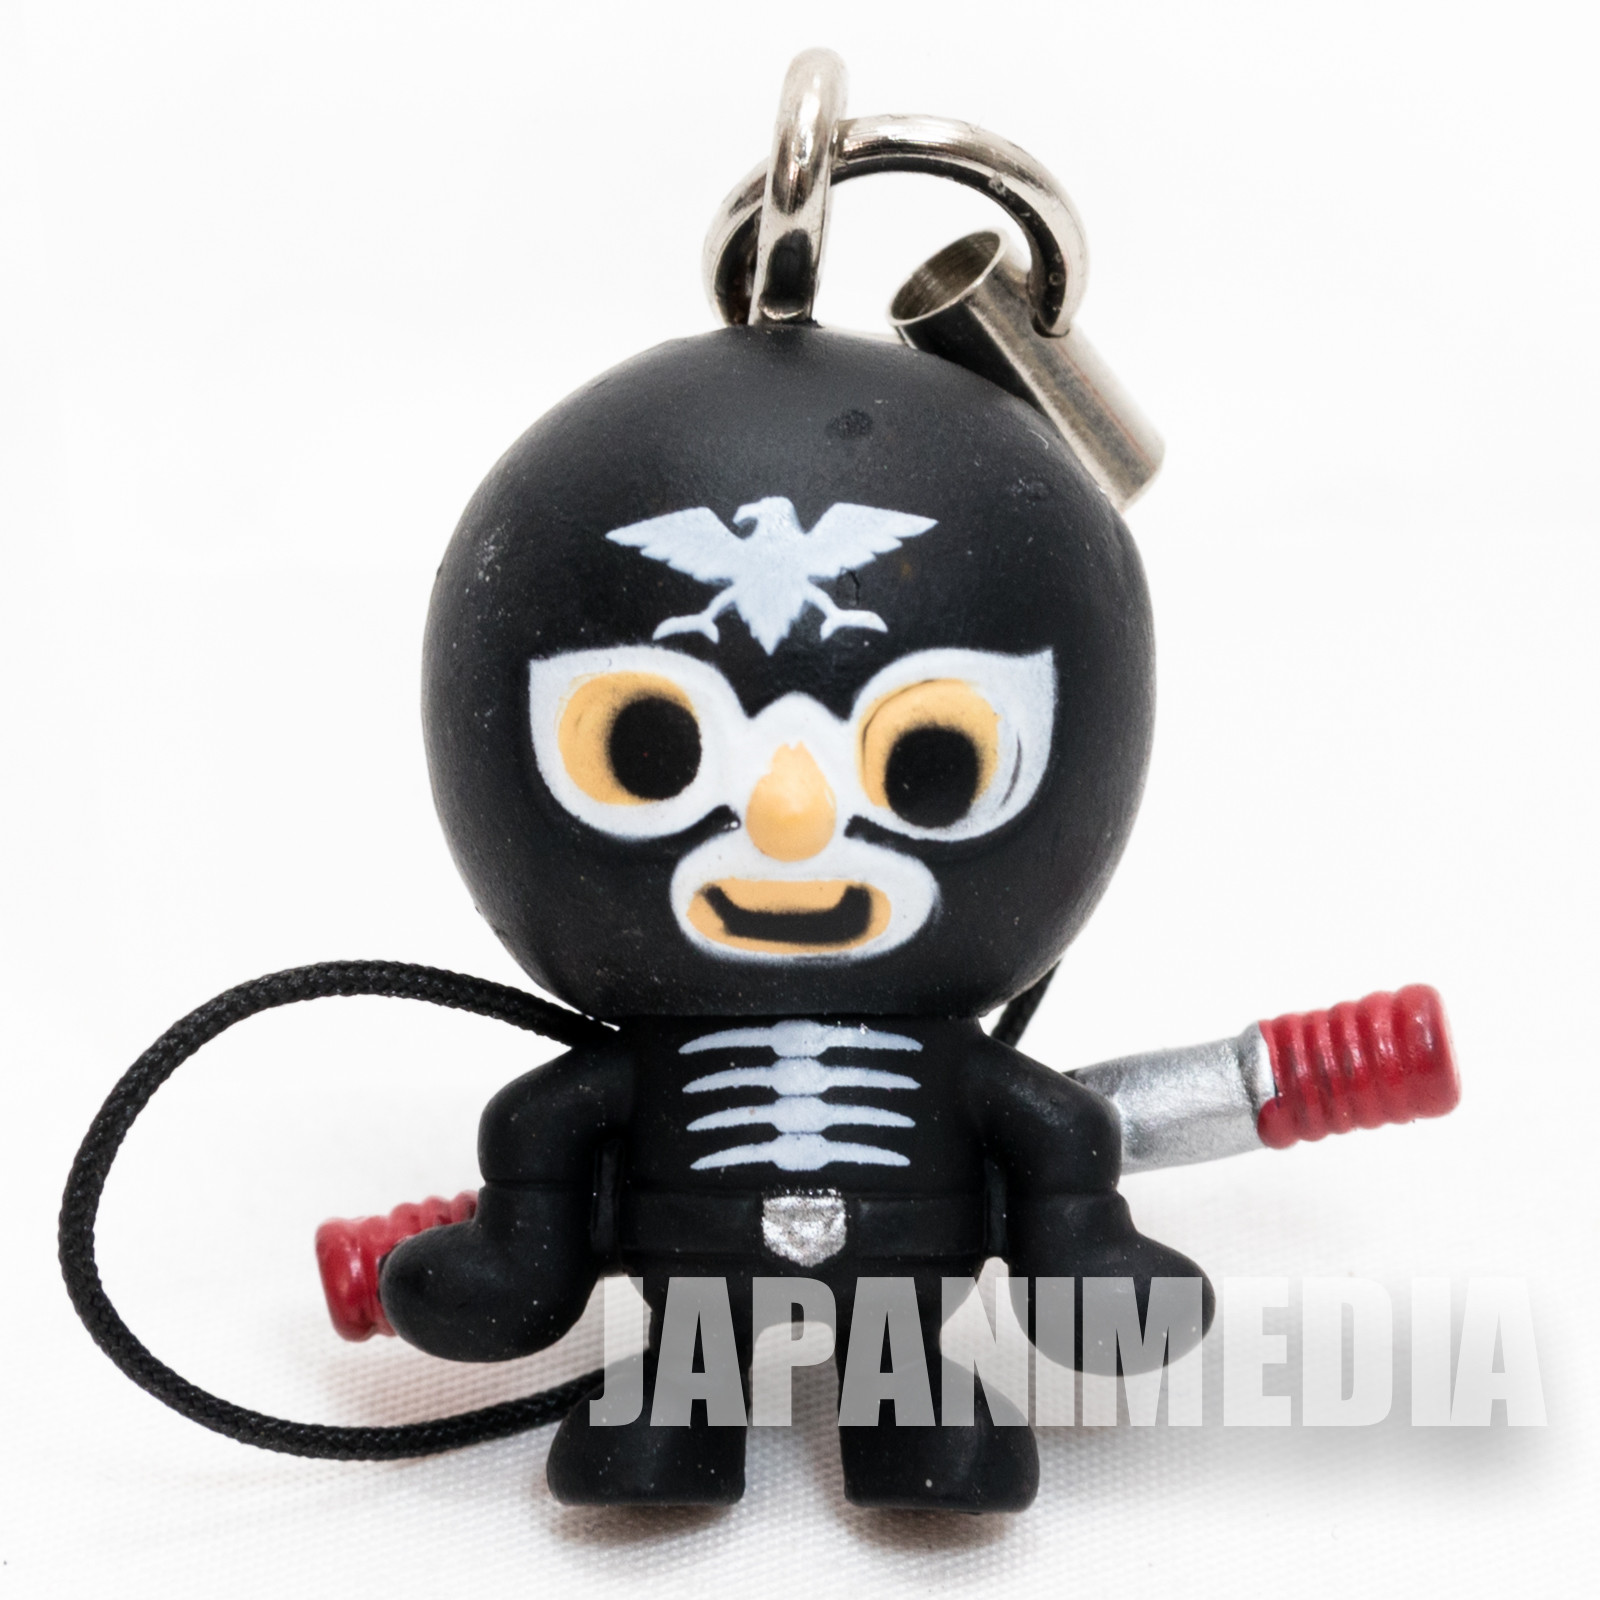 Masked Rider Combatman x Panson Works Figure Strap Shotaro Ishinomori Characters